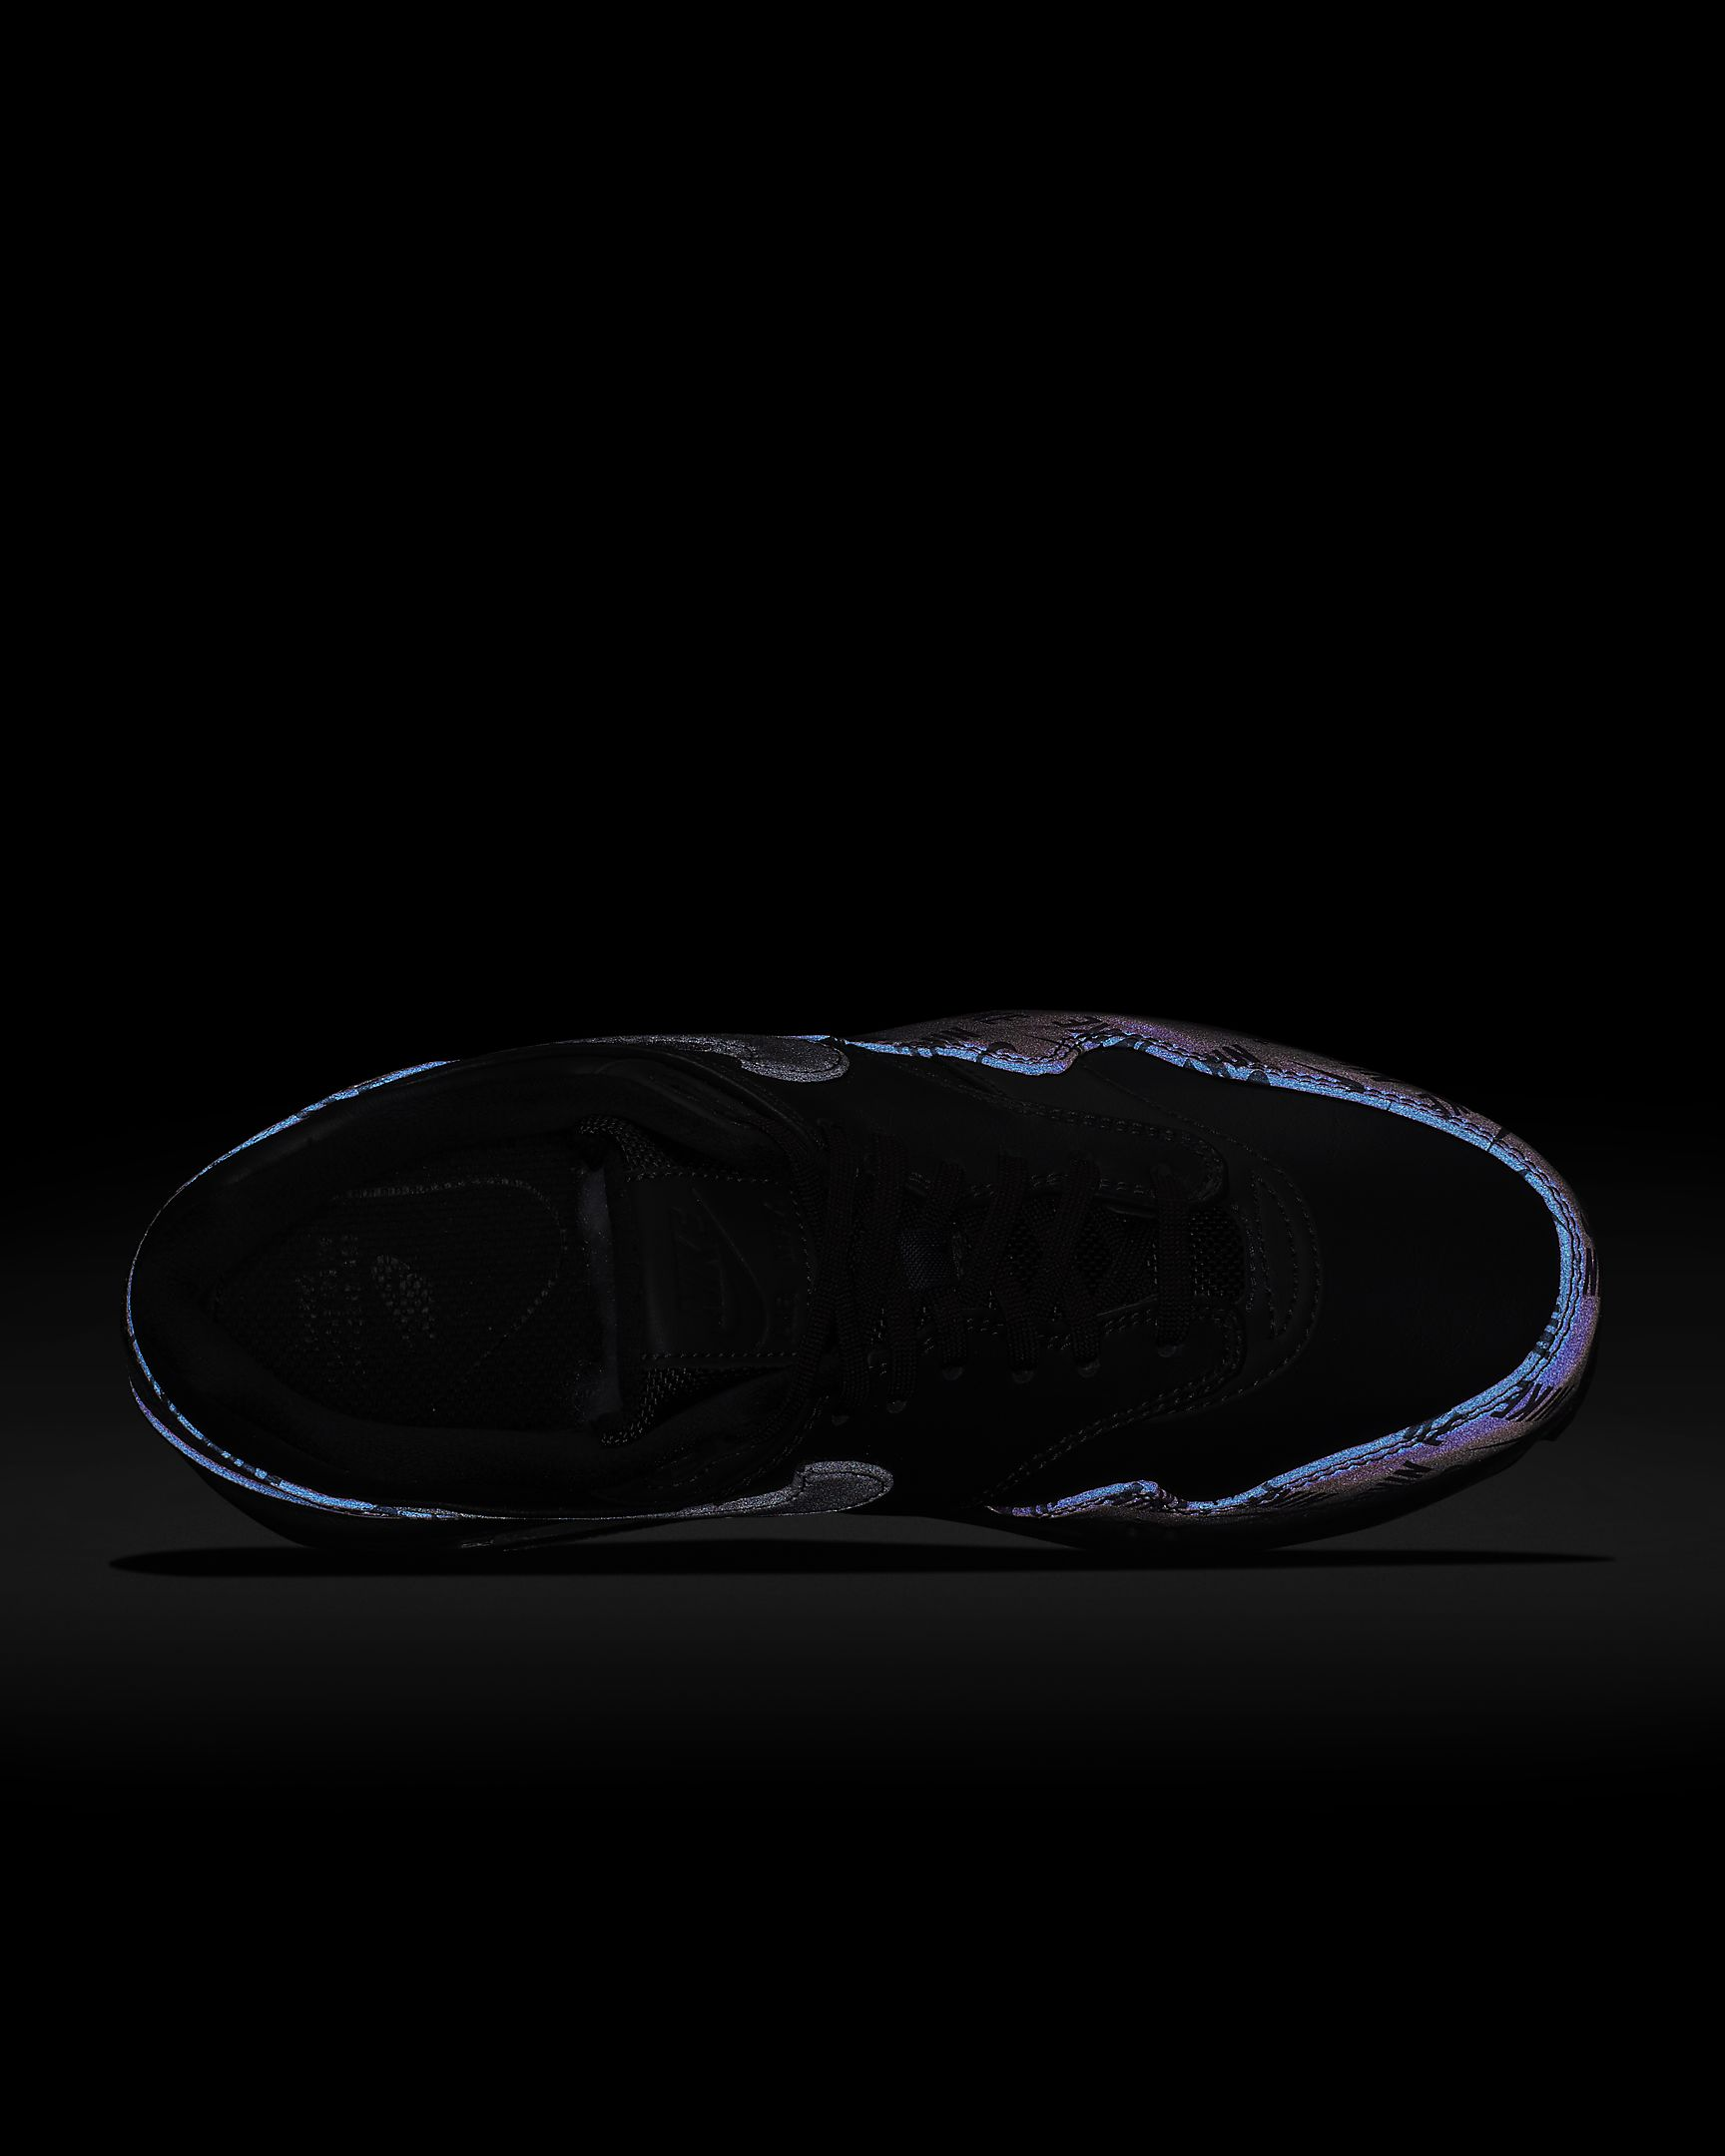 fab26564fc Nike Wmns Air Max 1 LX Glow in the Dark Shown: Oil Grey/Oil Grey/Oil Grey  Style: 917691-001